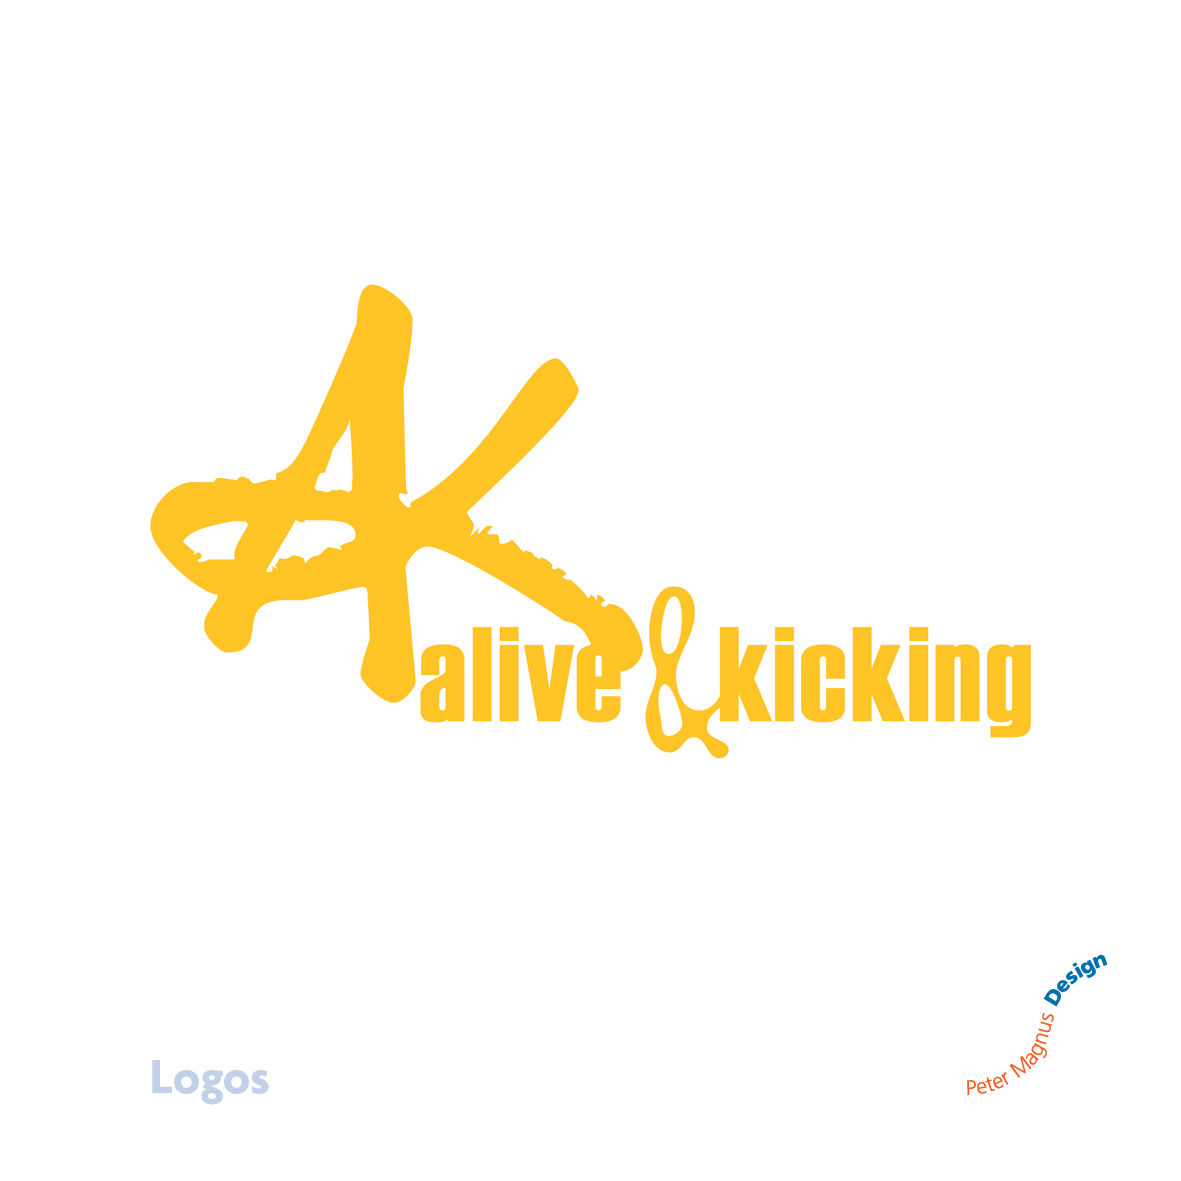 Alive and Kicking church youth club logo